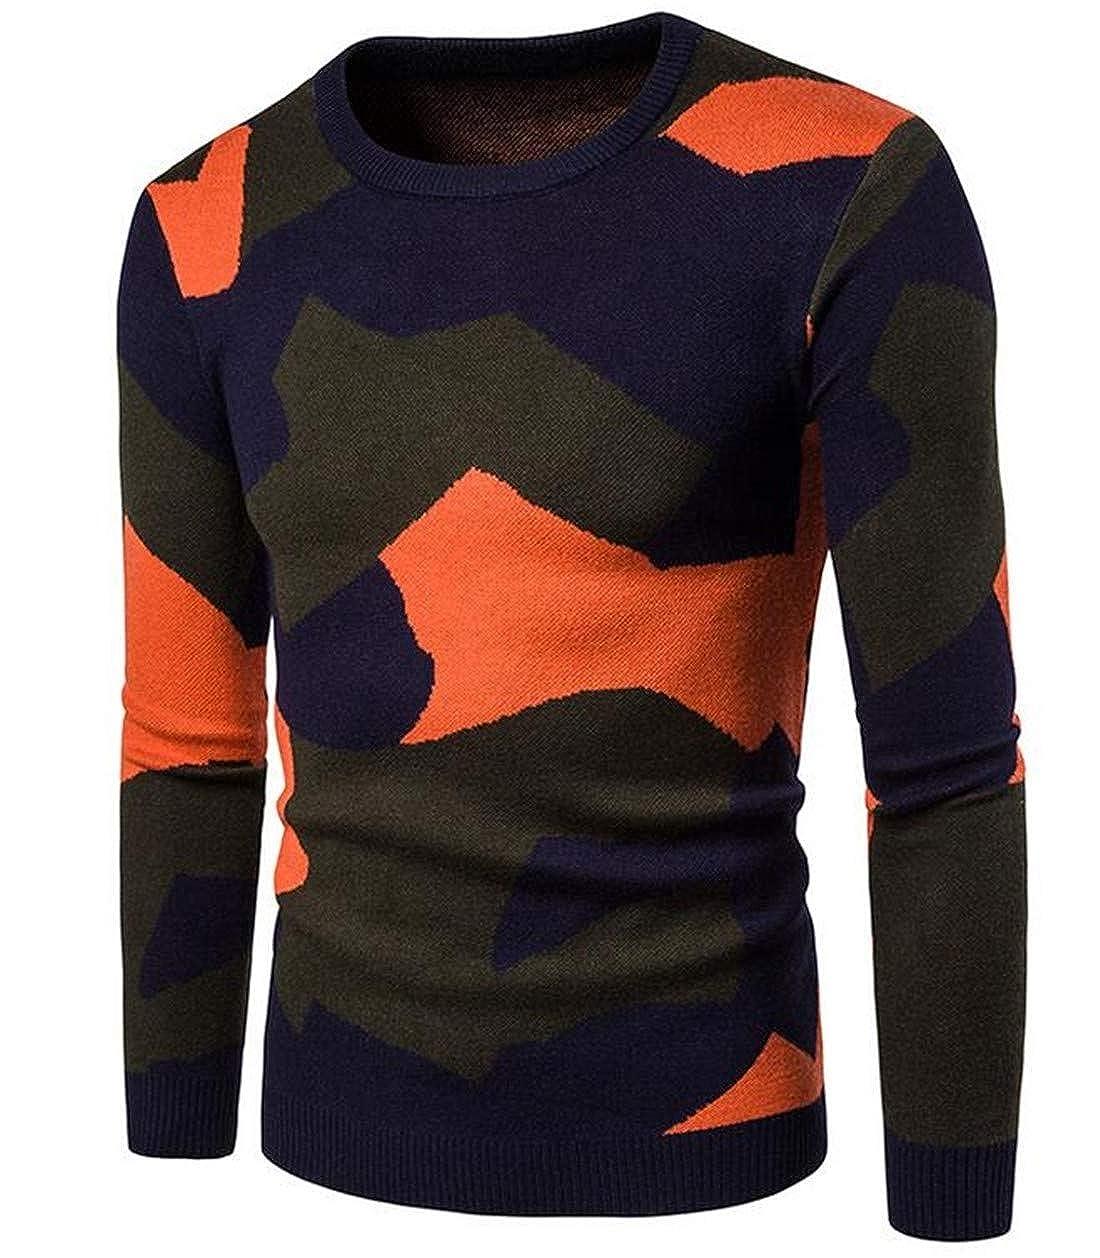 UUYUK Men Stitching Camo Print Knit Long Sleeve Slim Fit Round Neck Pullover Sweater